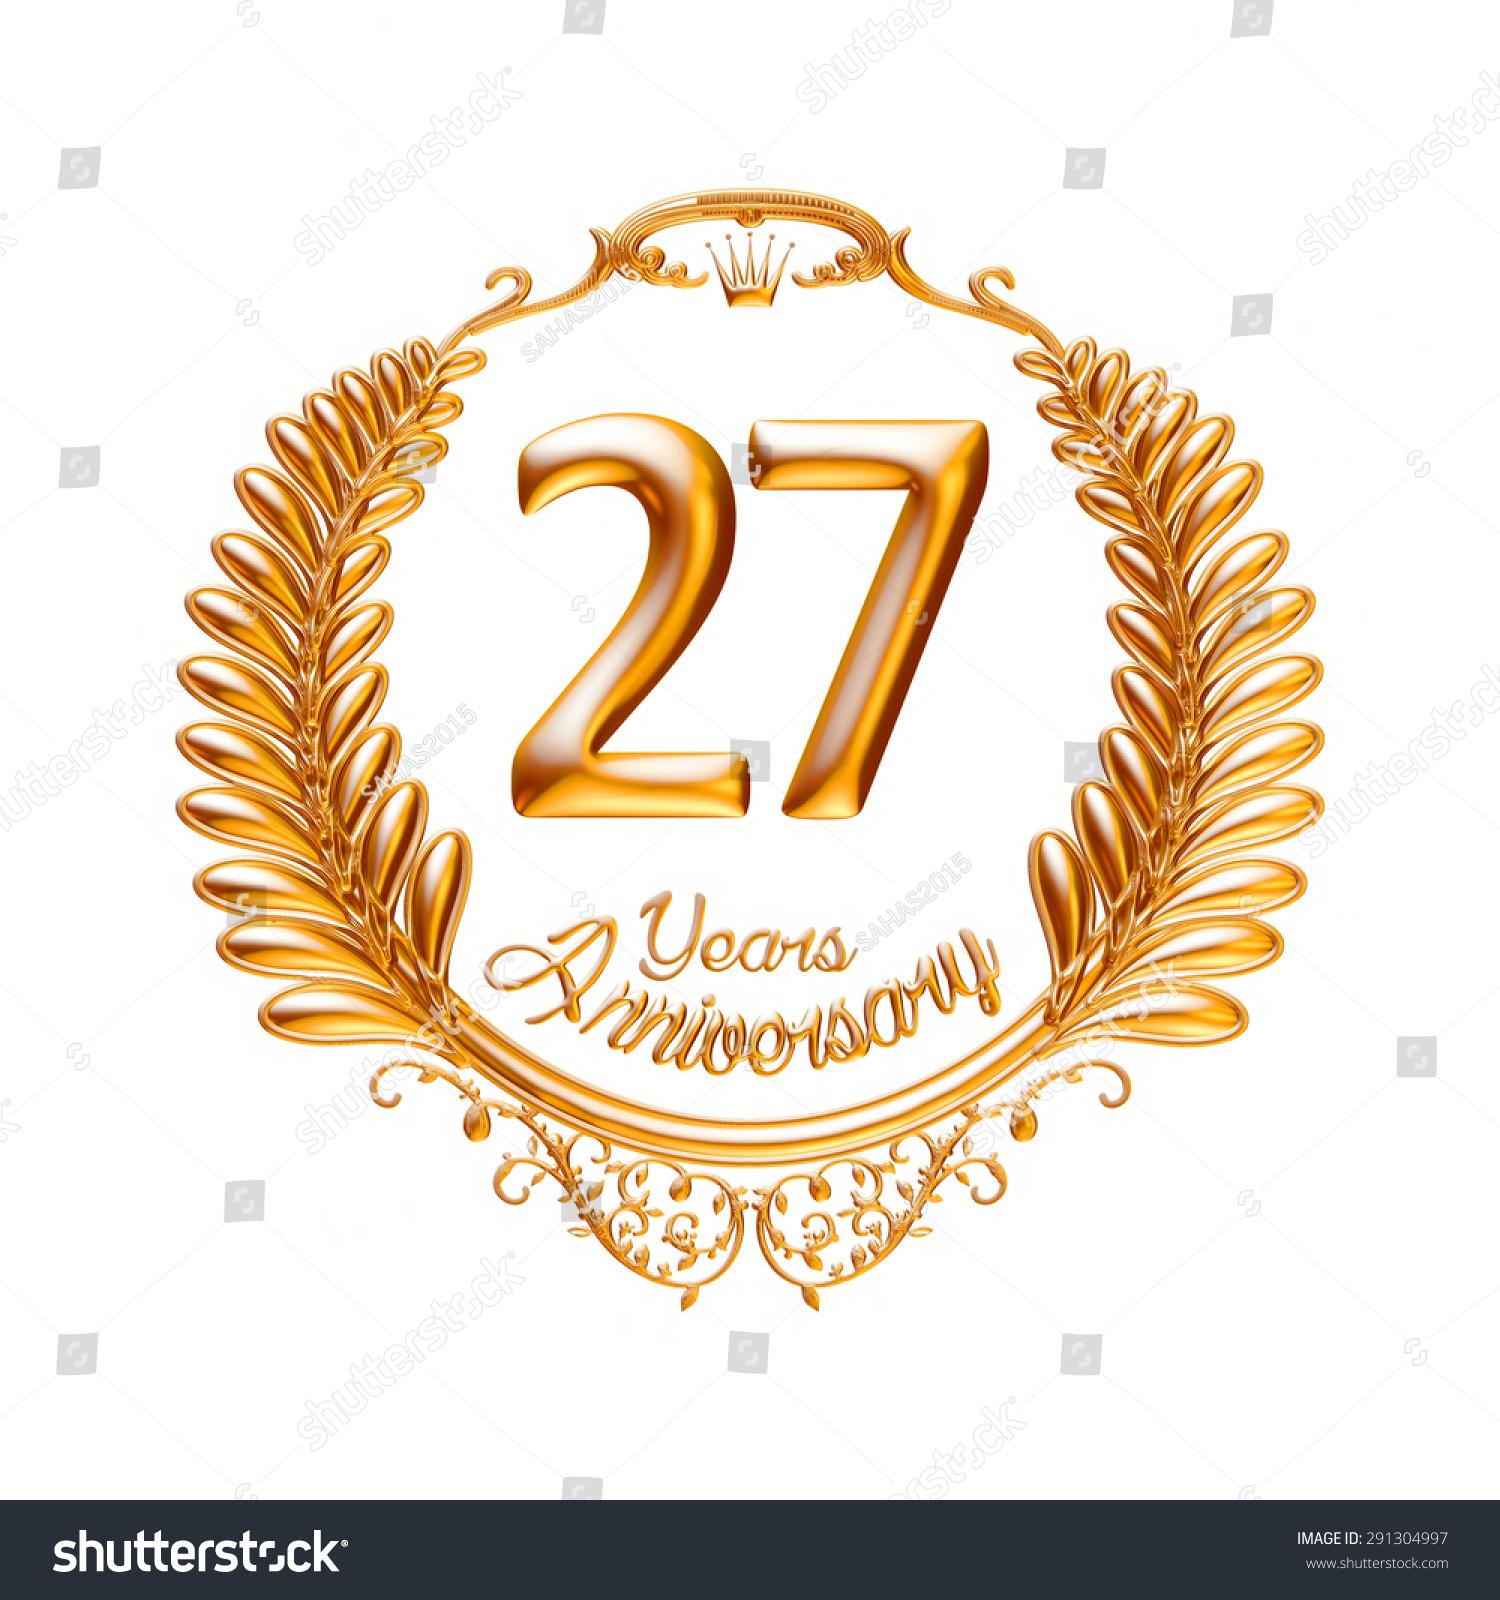 Wedding Anniversary Gifts 27th Year : 27 Yr Anniversary Related Keywords & Suggestions - 27 Yr Anniversary ...